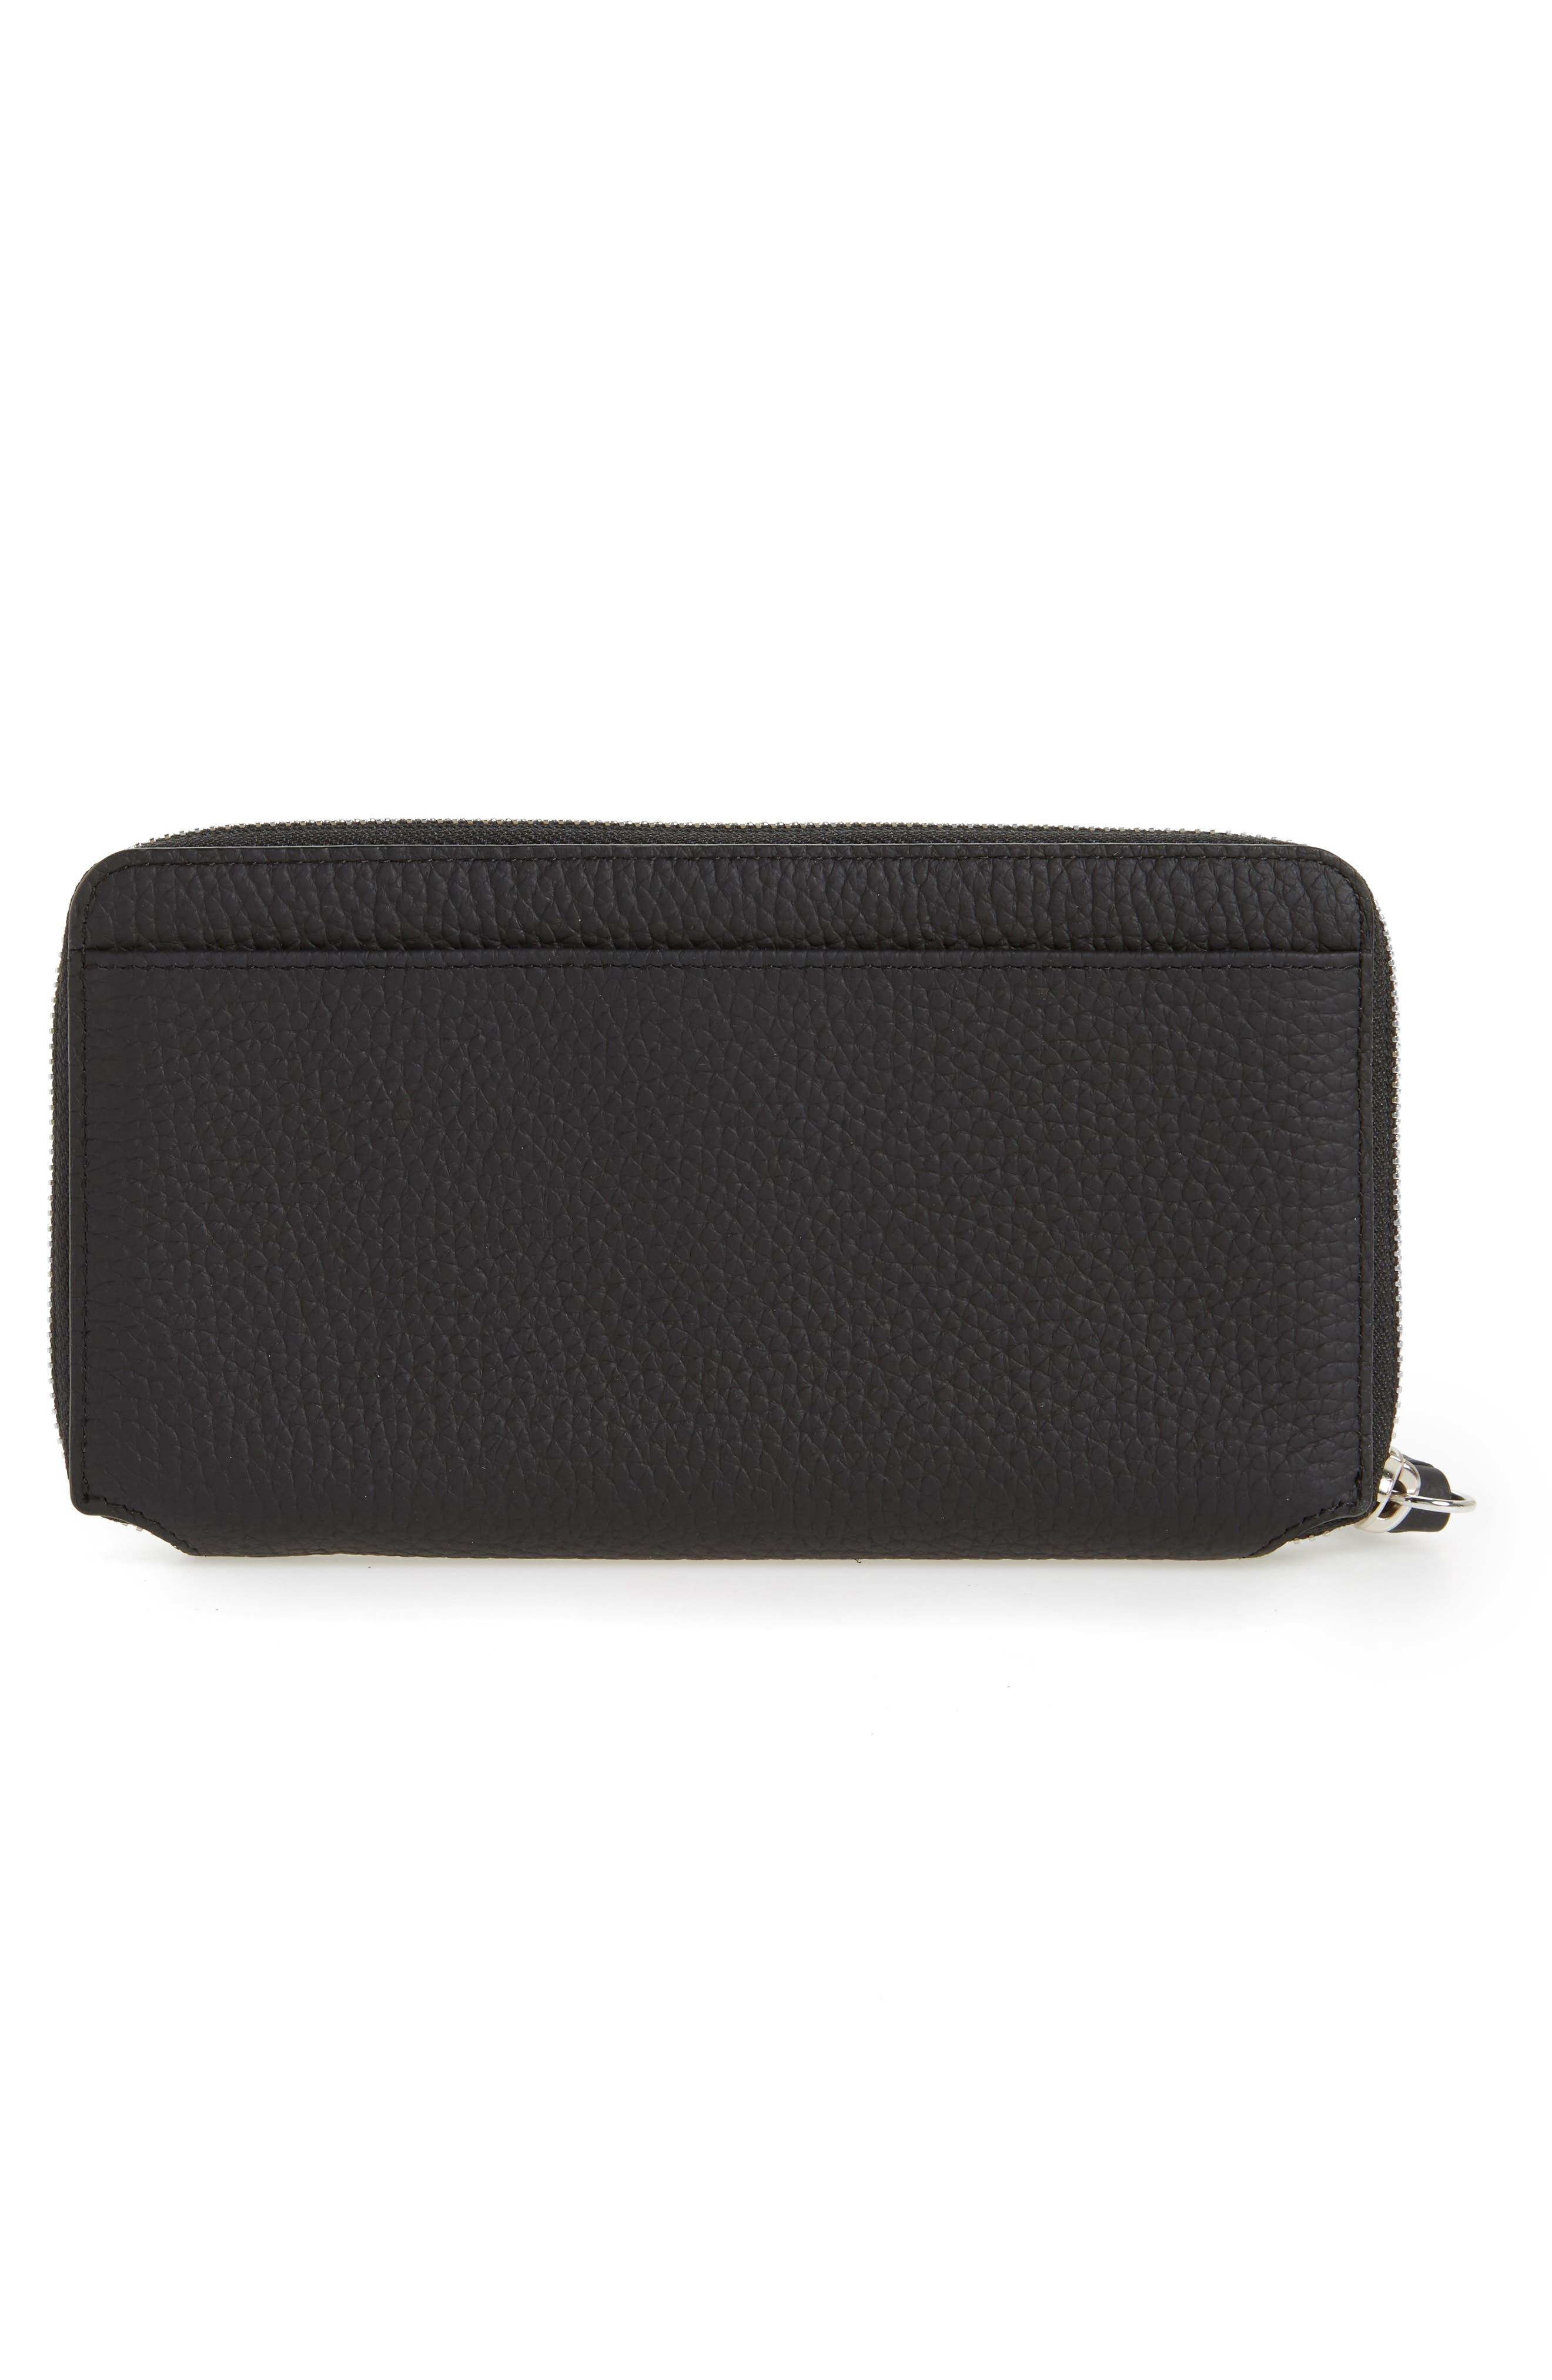 Fetch Leather Phone Wristlet,                             Alternate thumbnail 3, color,                             Black